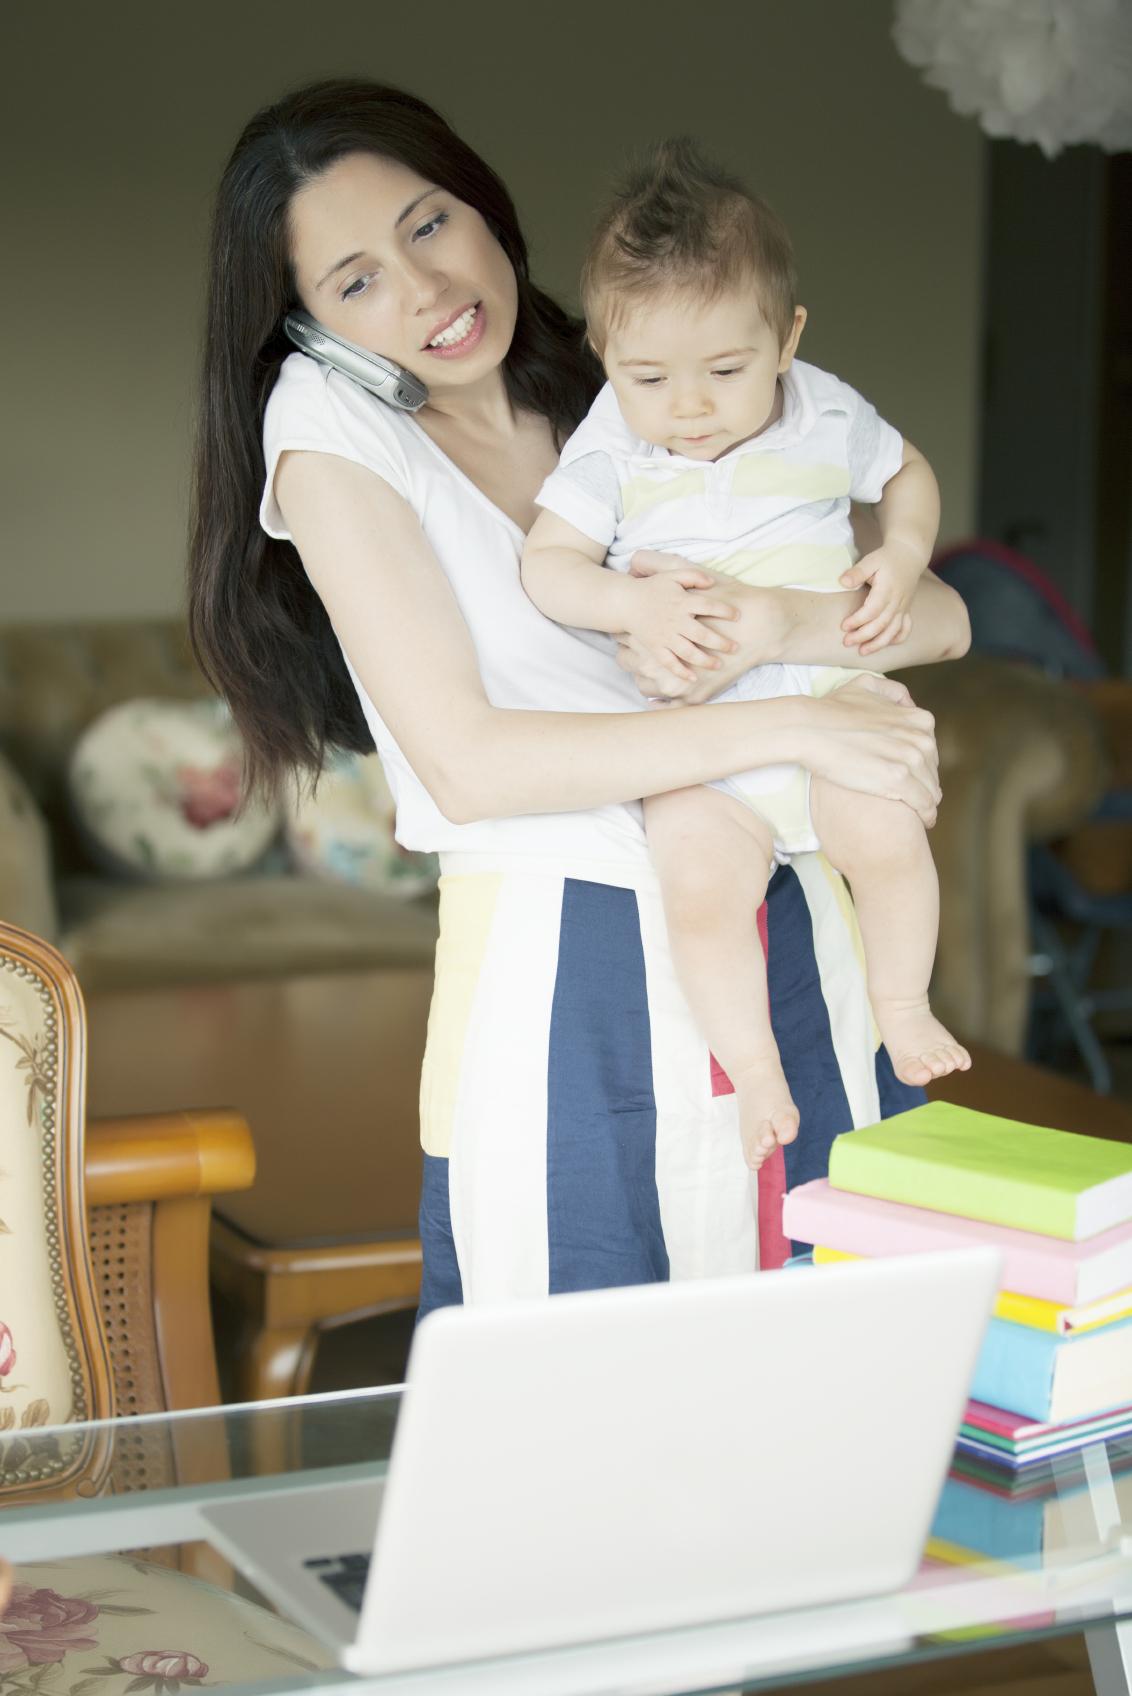 Work/Life Balance: 5 Things Female Entrepreneurs must do to stay sane